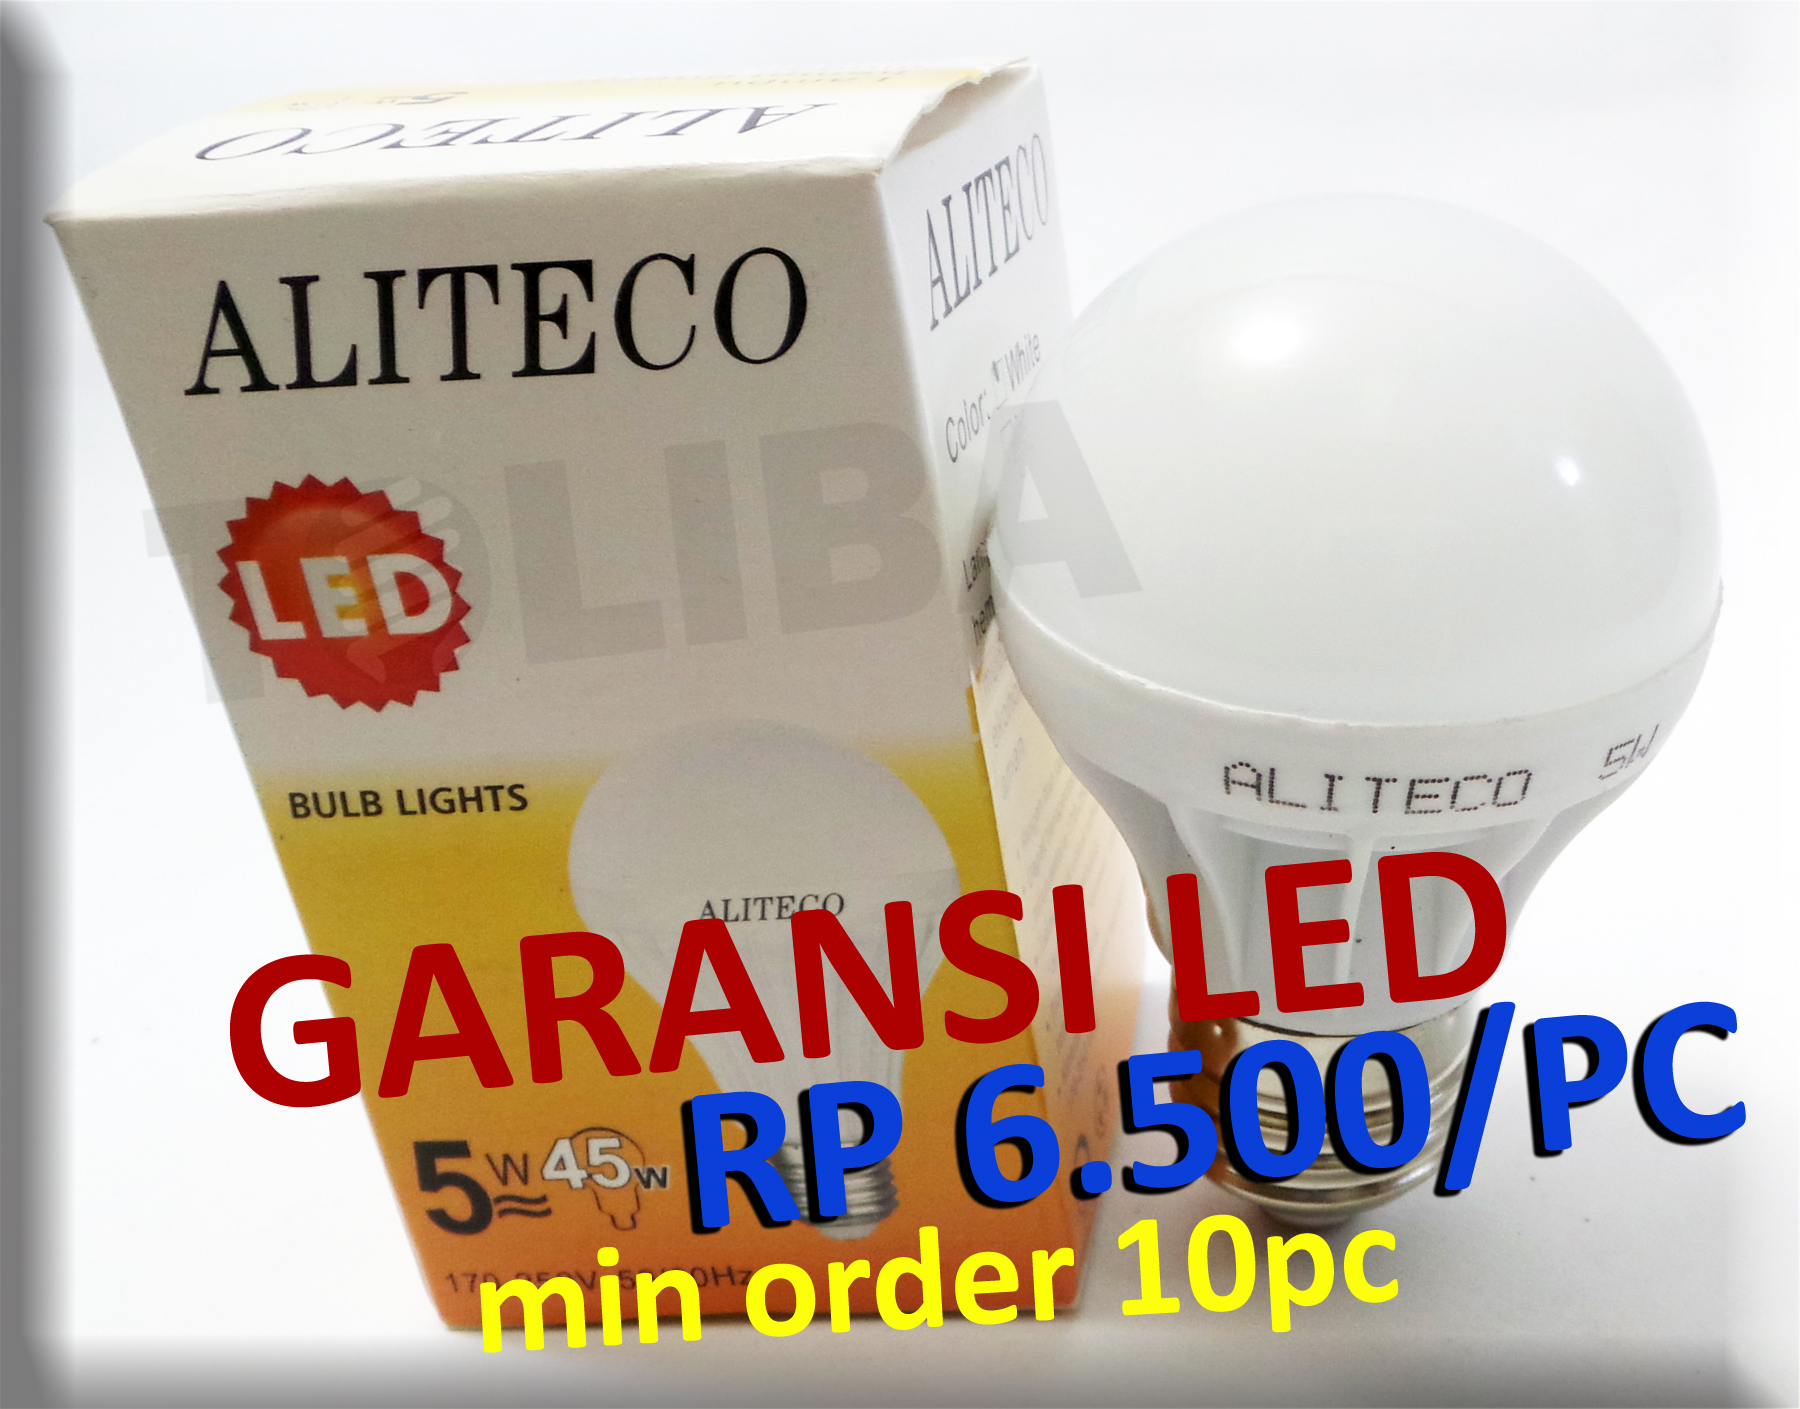 Aliteco Led Lampu 5 Watt Setara 45 Biasa Update Daftar Bulb Bohlam 15 Daylight Jual Hemat Listrik Termurah Toliba Tokopedia